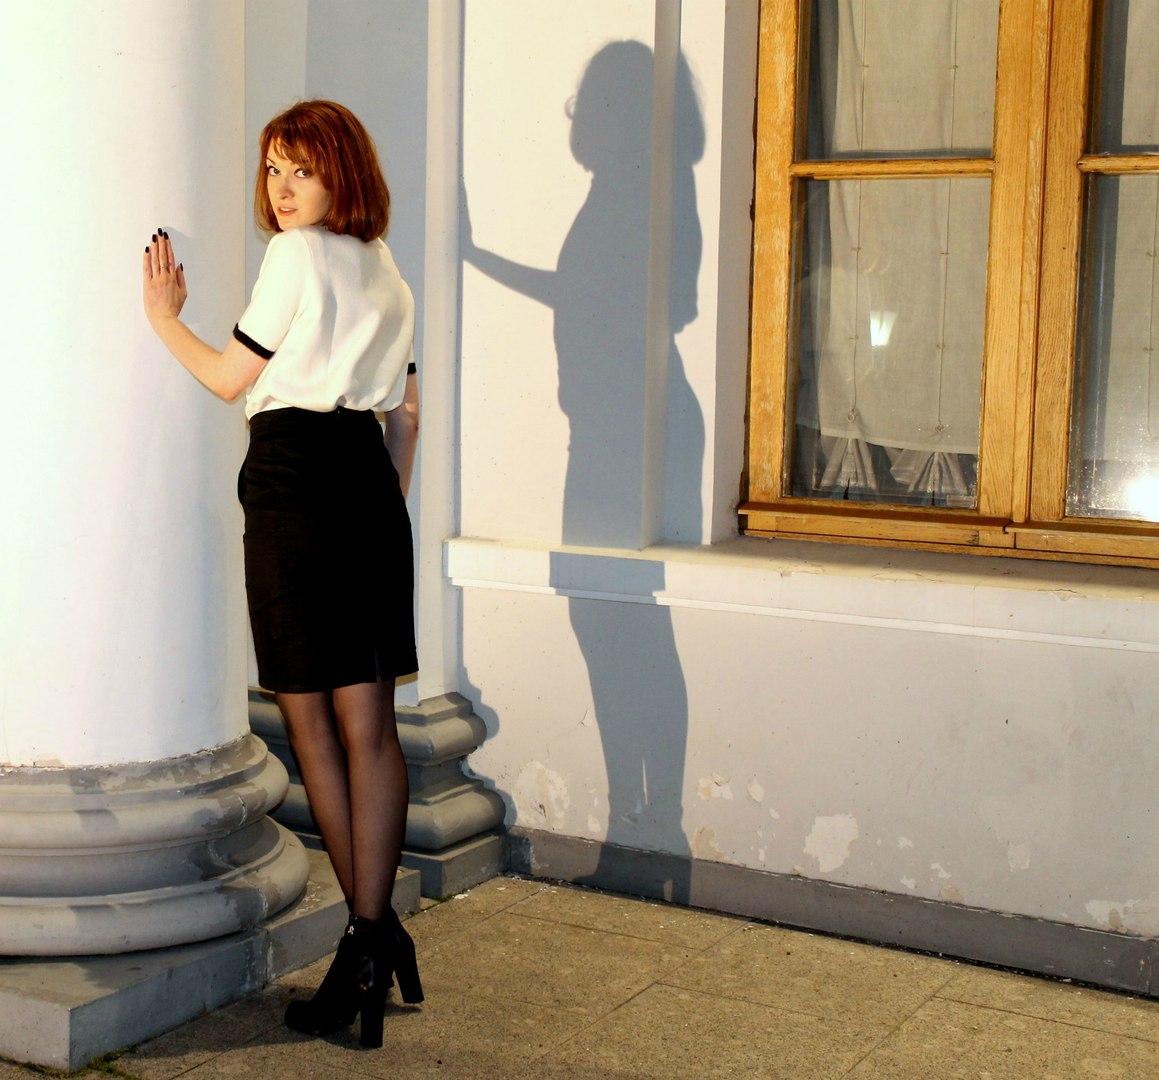 Дарья Булгакова, Санкт-Петербург - фото №1